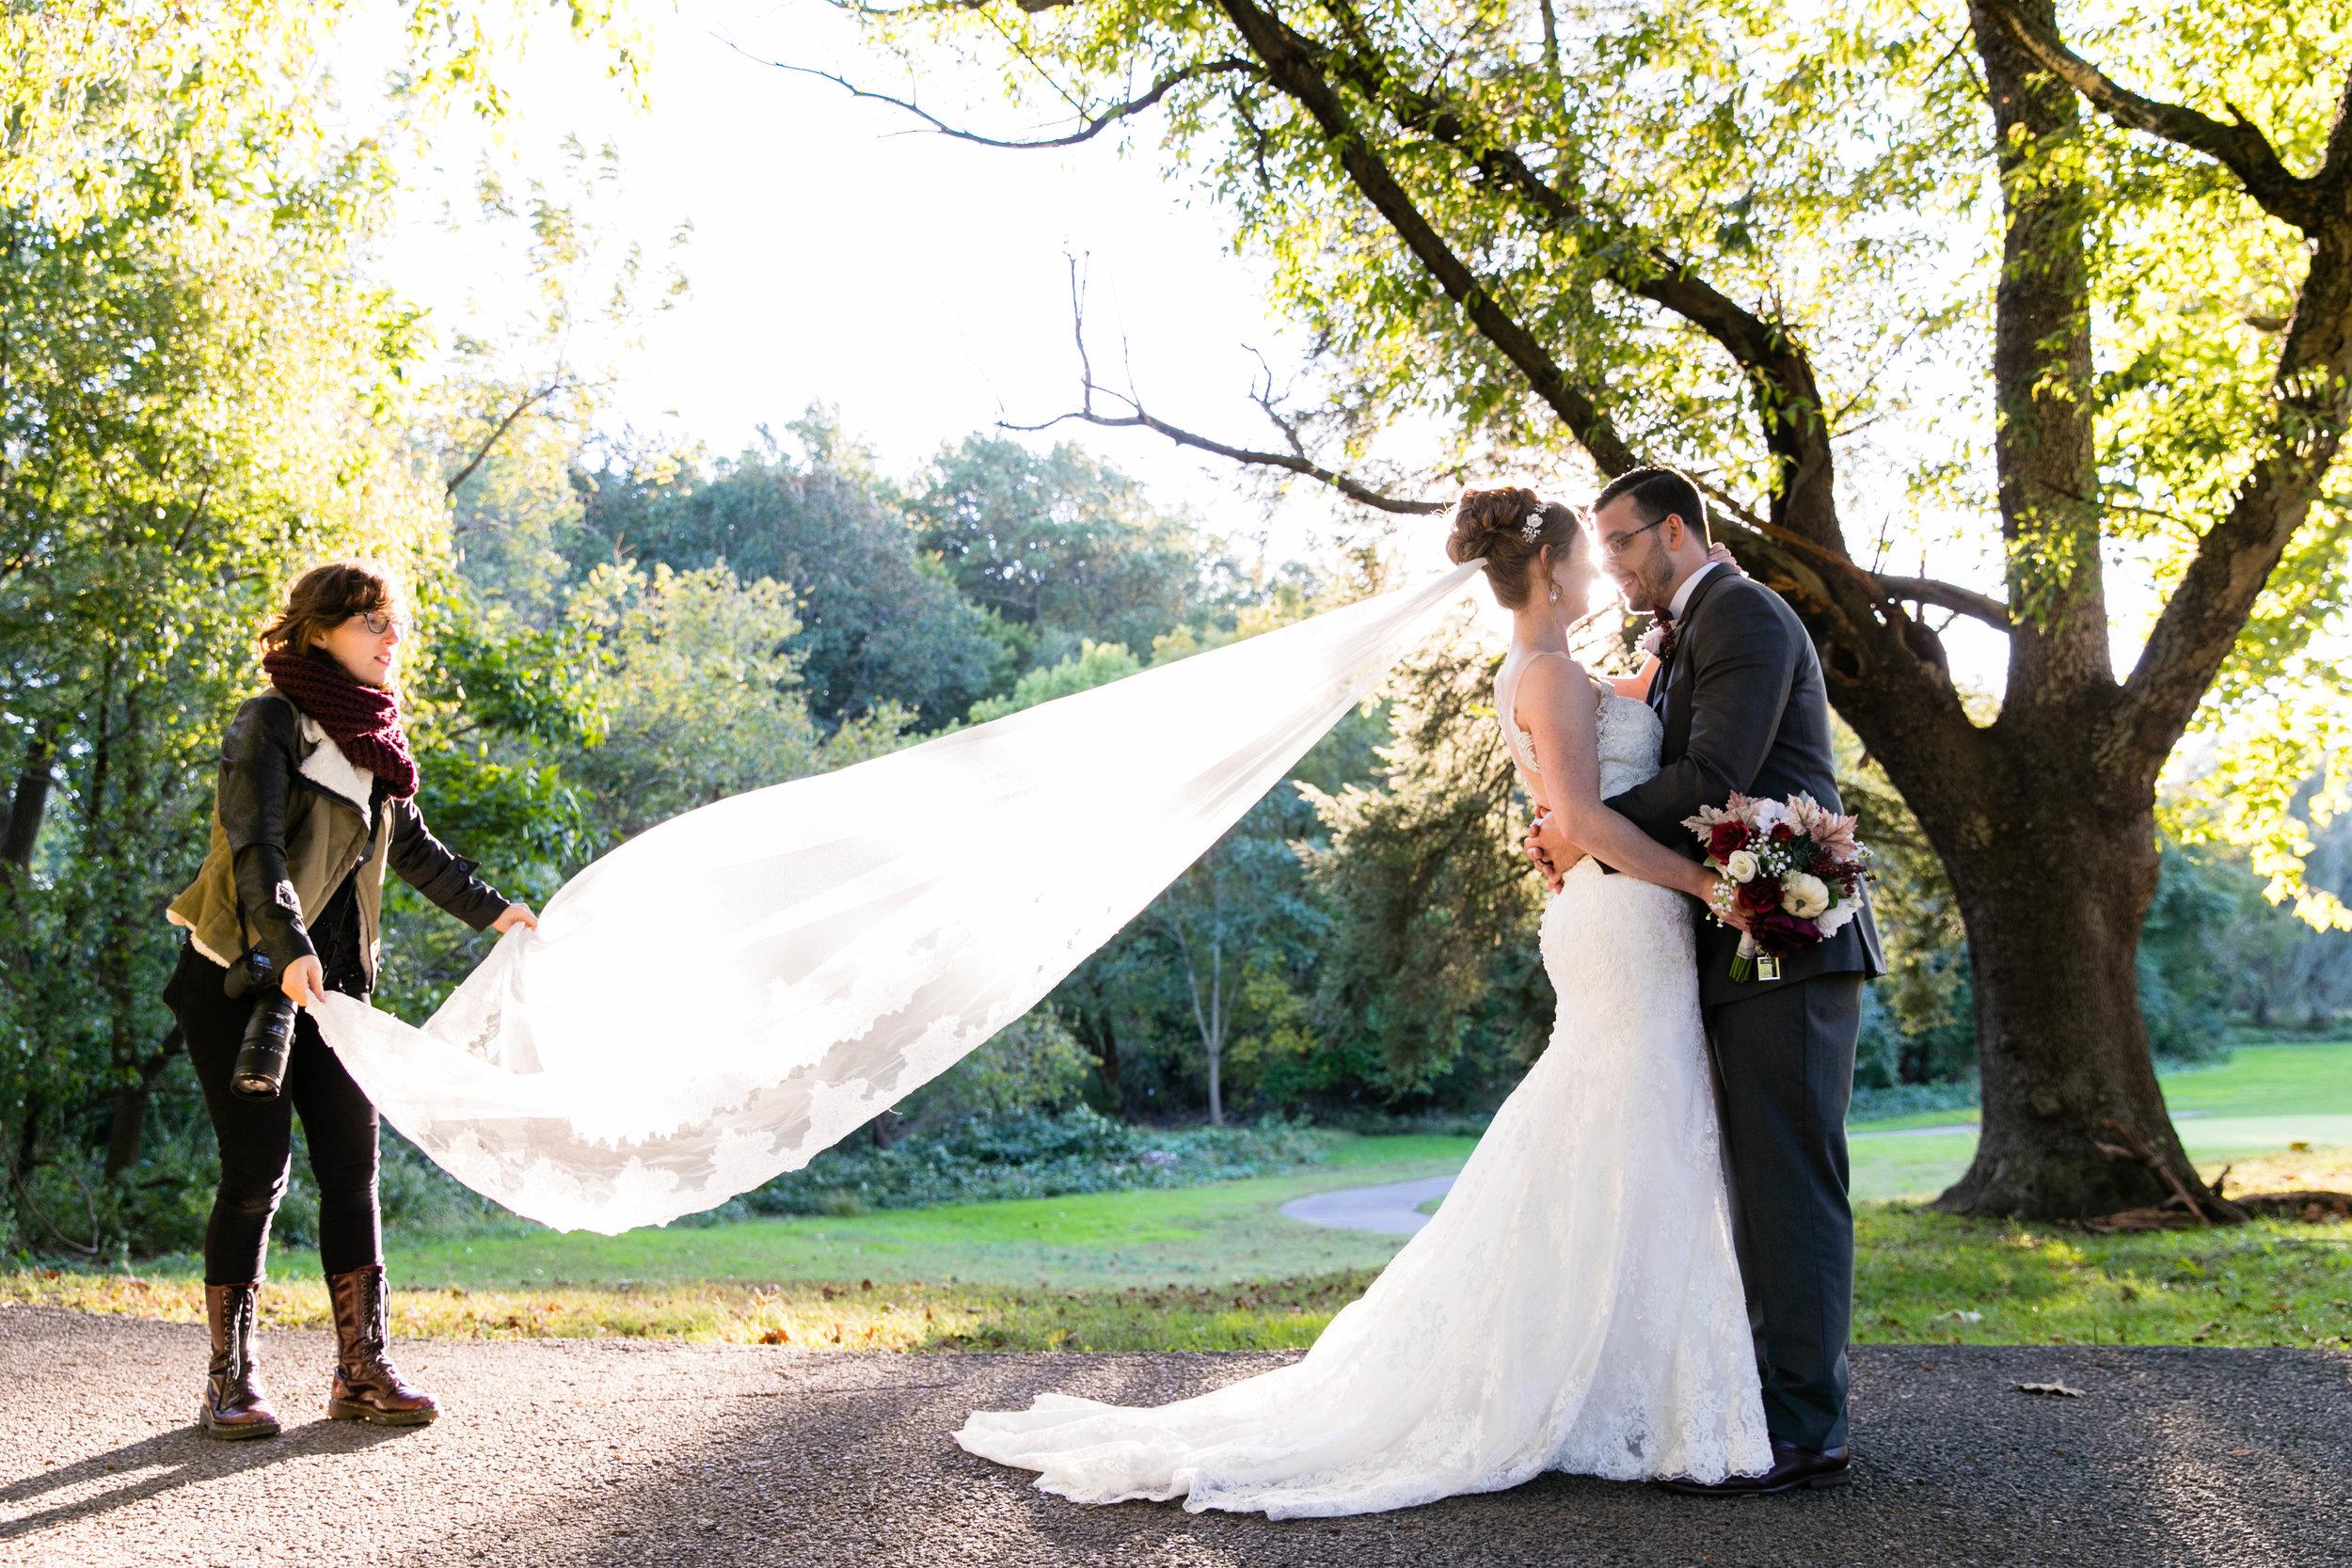 Ashly and Joe - Felt Factory Wedding - Harry Potter Themed Wedding - 079.jpg